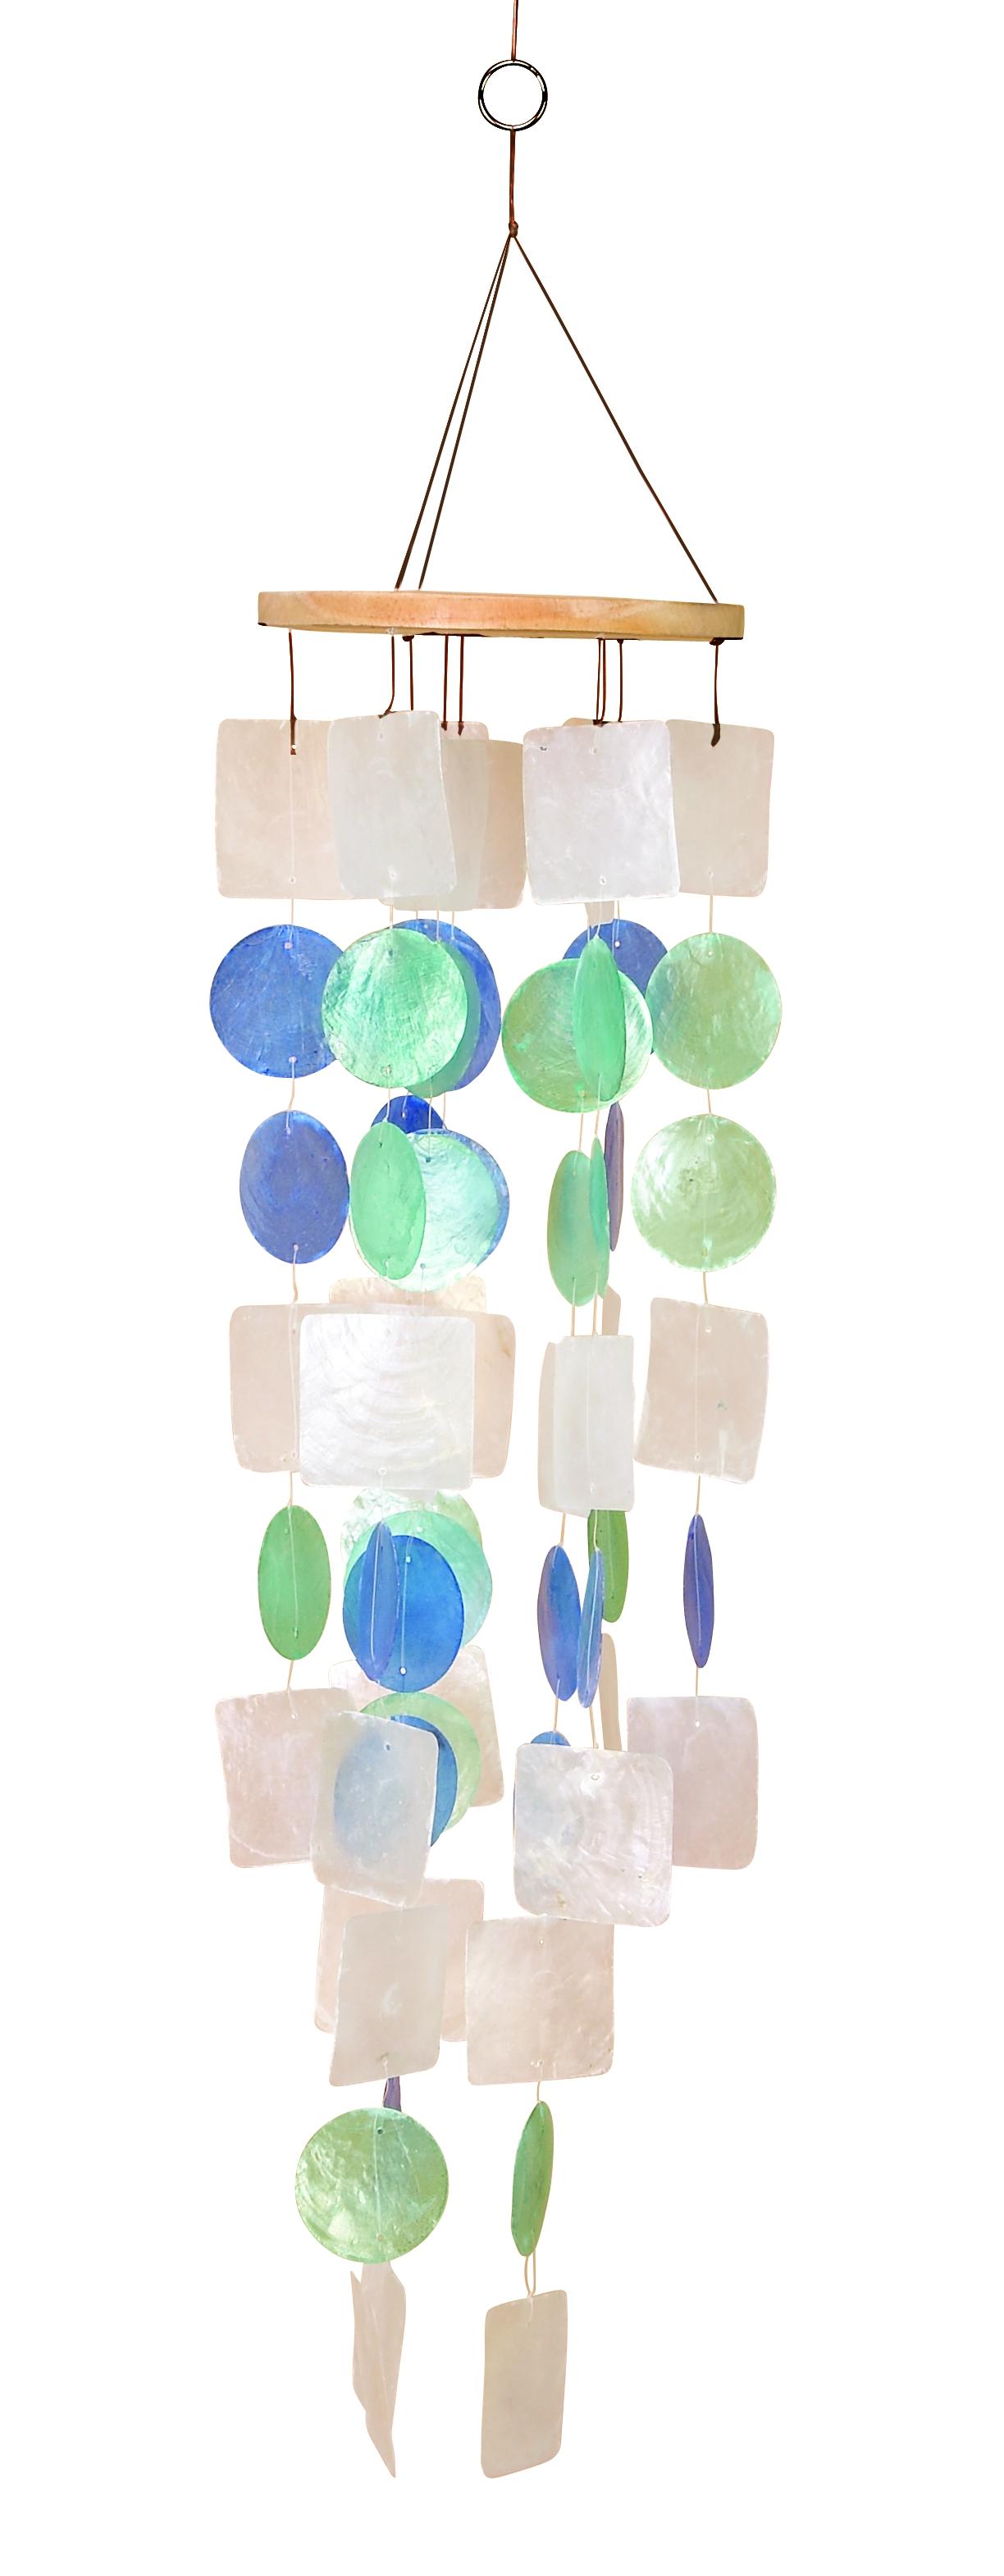 Capiz Shell Wind Chimes~Nautical Seashell Decor 5 Colorful Selections